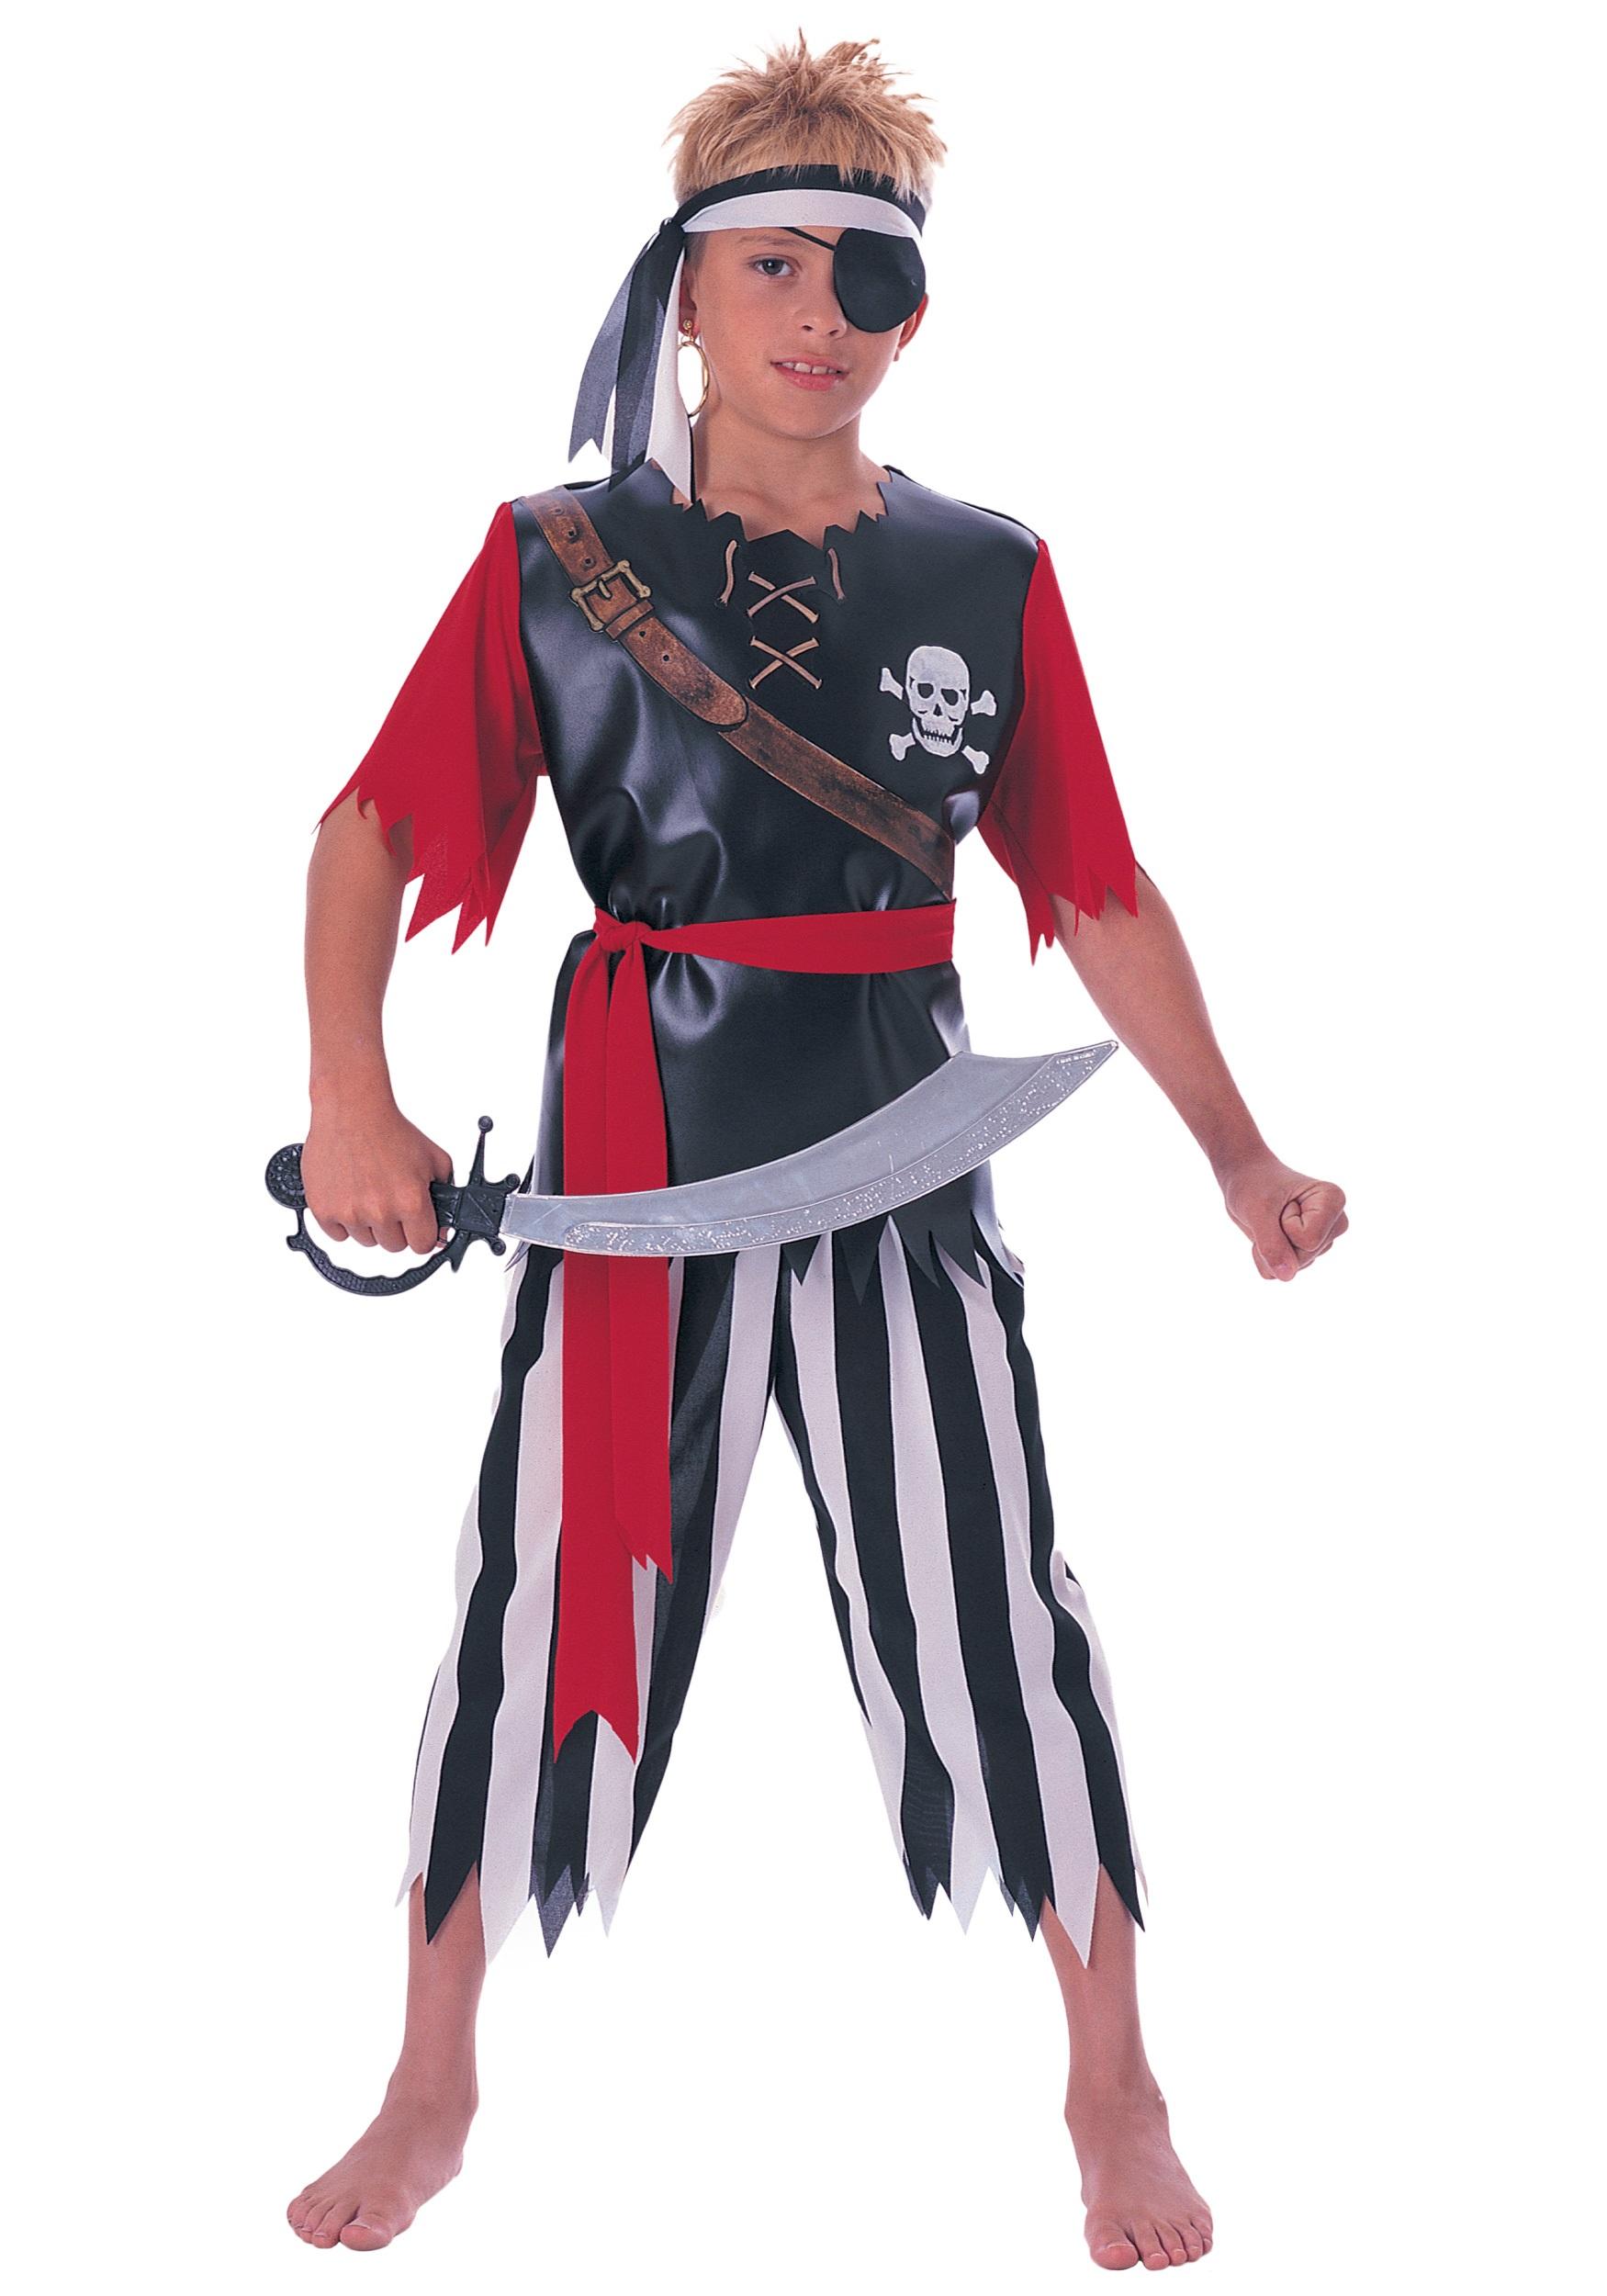 Child Pirate King Costume  sc 1 st  Halloween Costume & Child Pirate King Costume - Boys Halloween Costumes Pirate Costumes